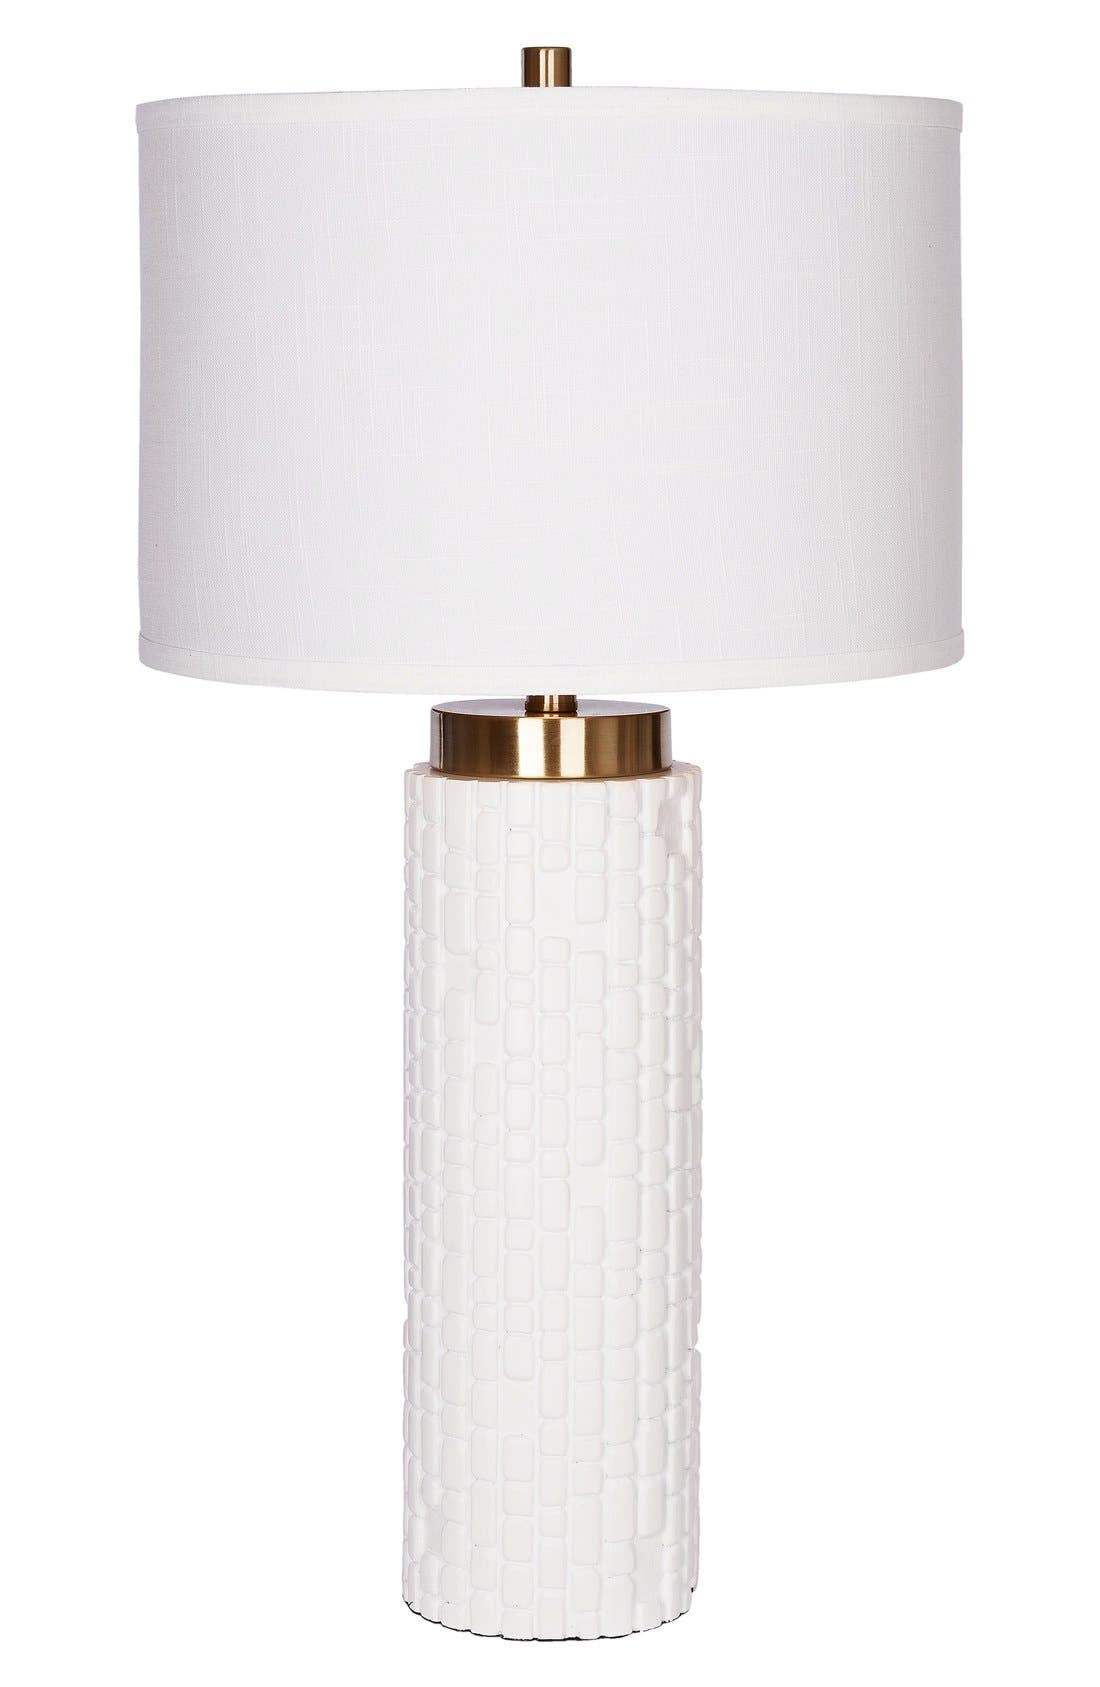 Alternate Image 1 Selected - JAlexander Mya Cylinder Table Lamp